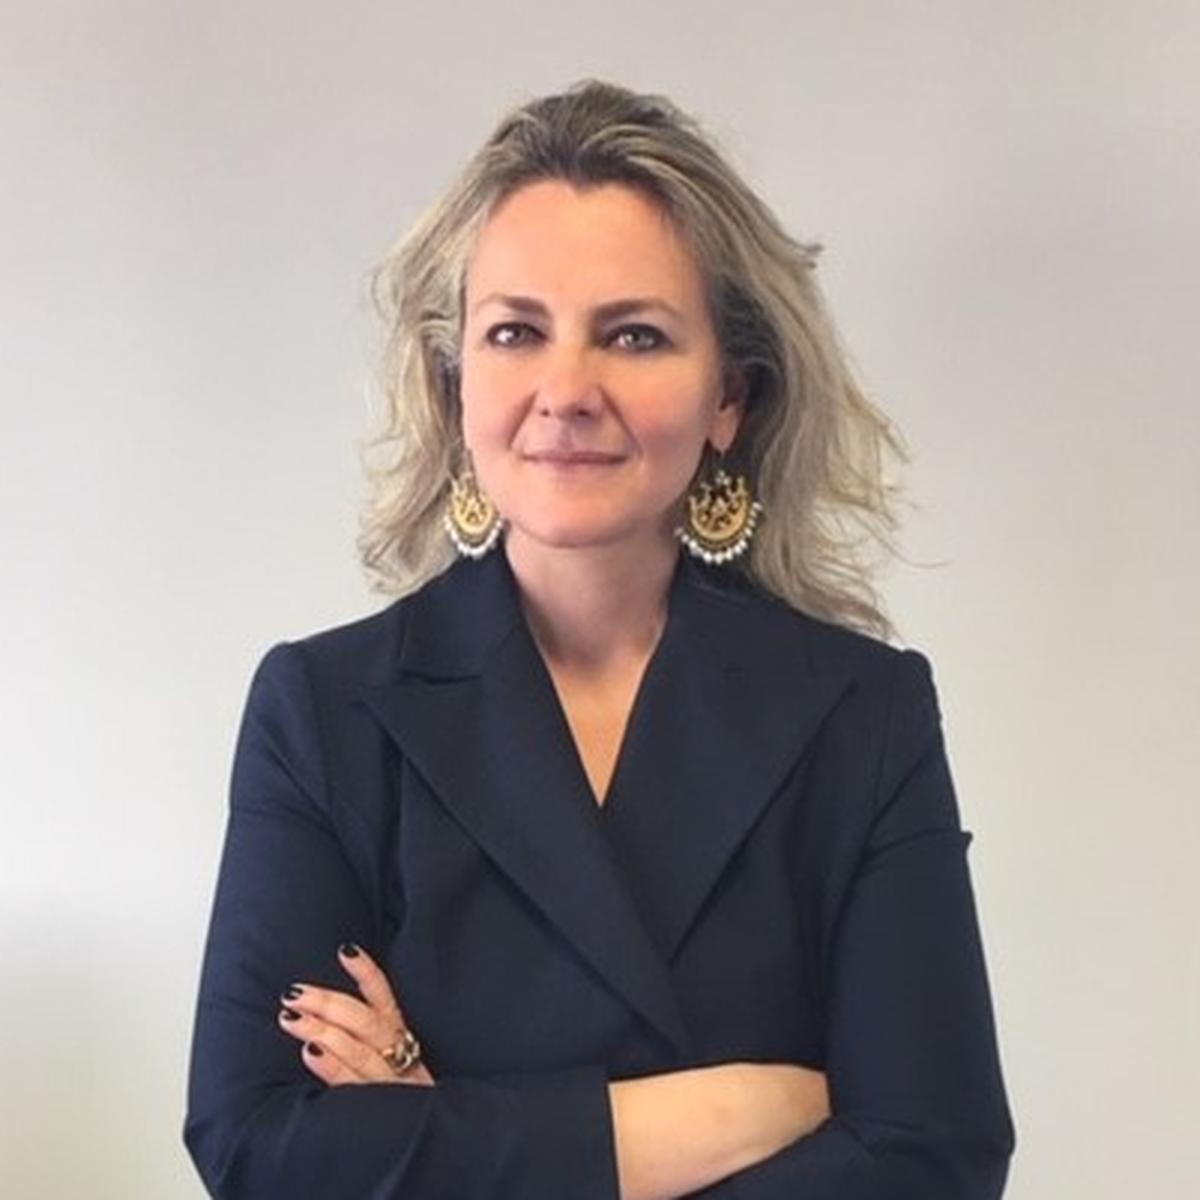 Alessia Canfarini